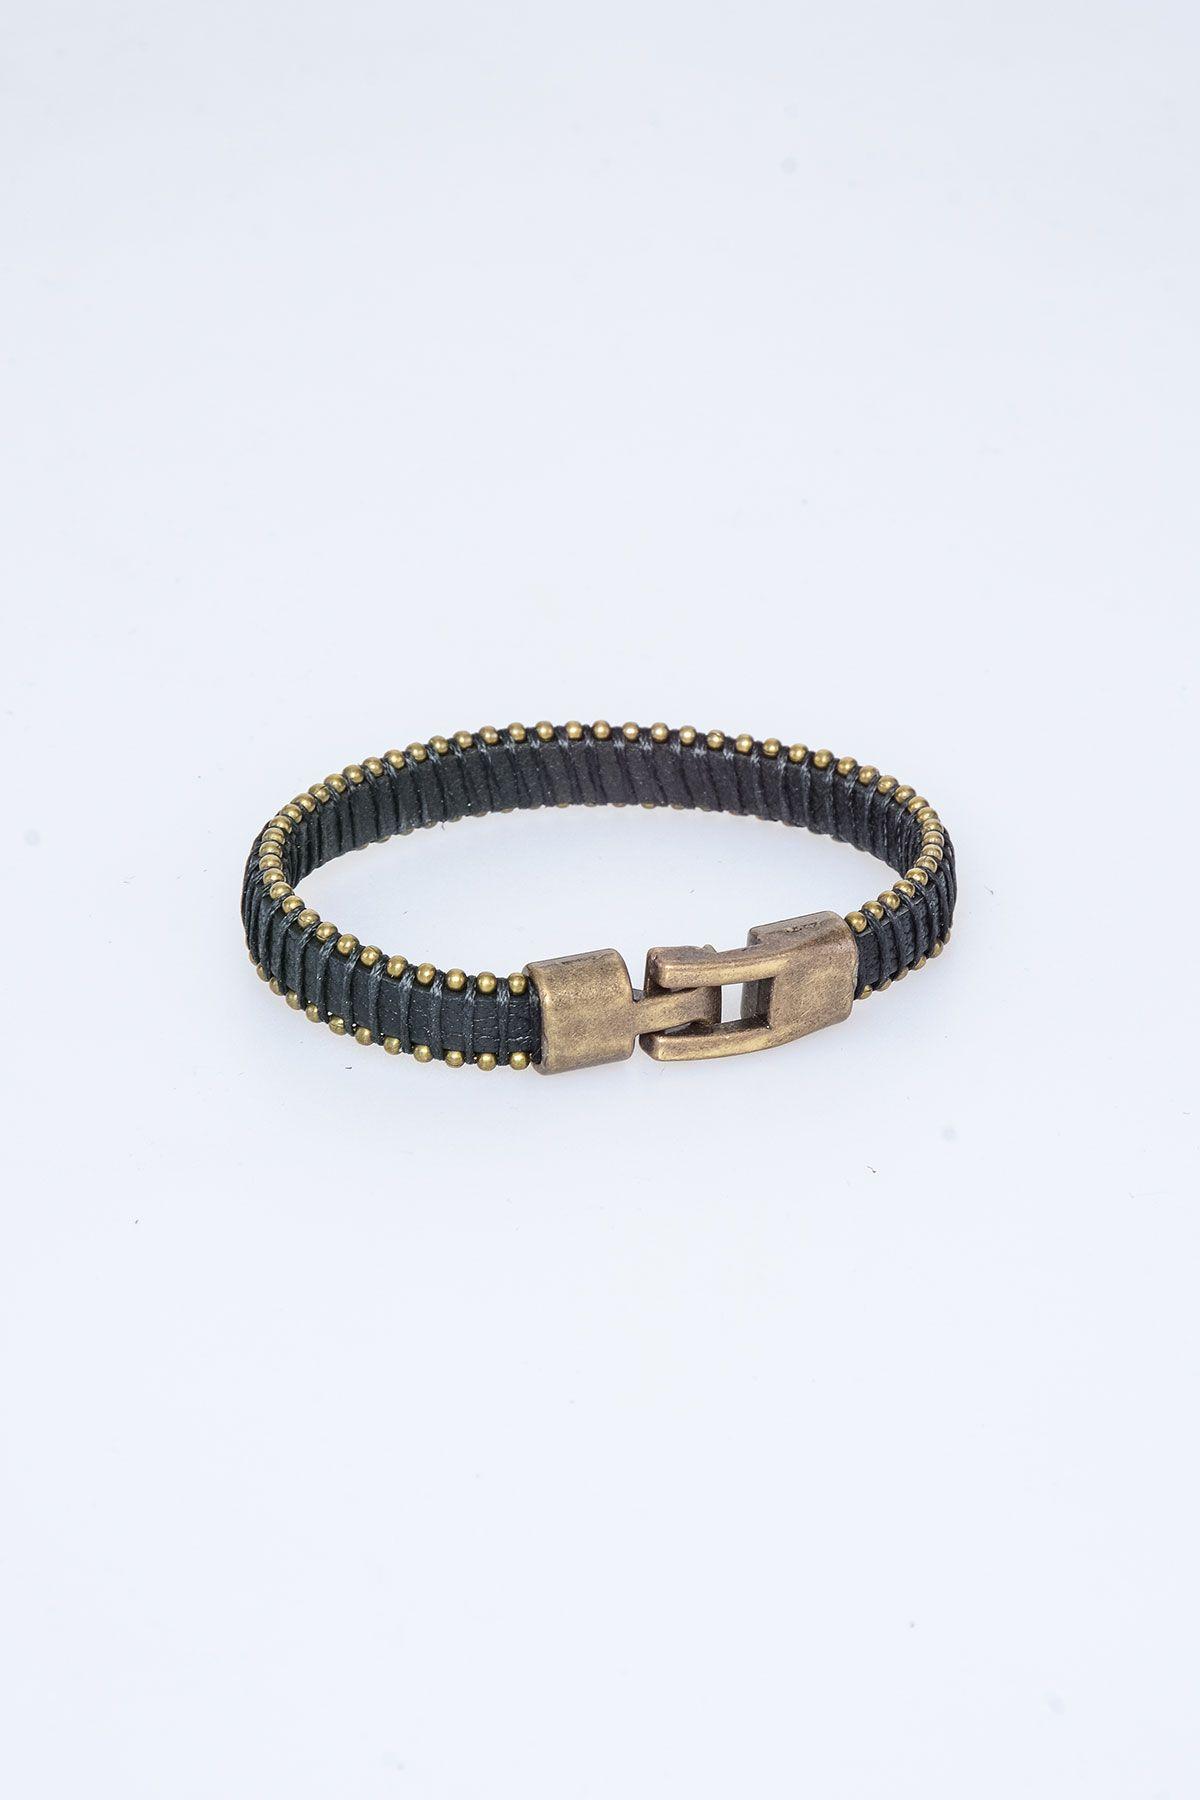 Pegia Genuine Leather Bracelet 19BL01 Black